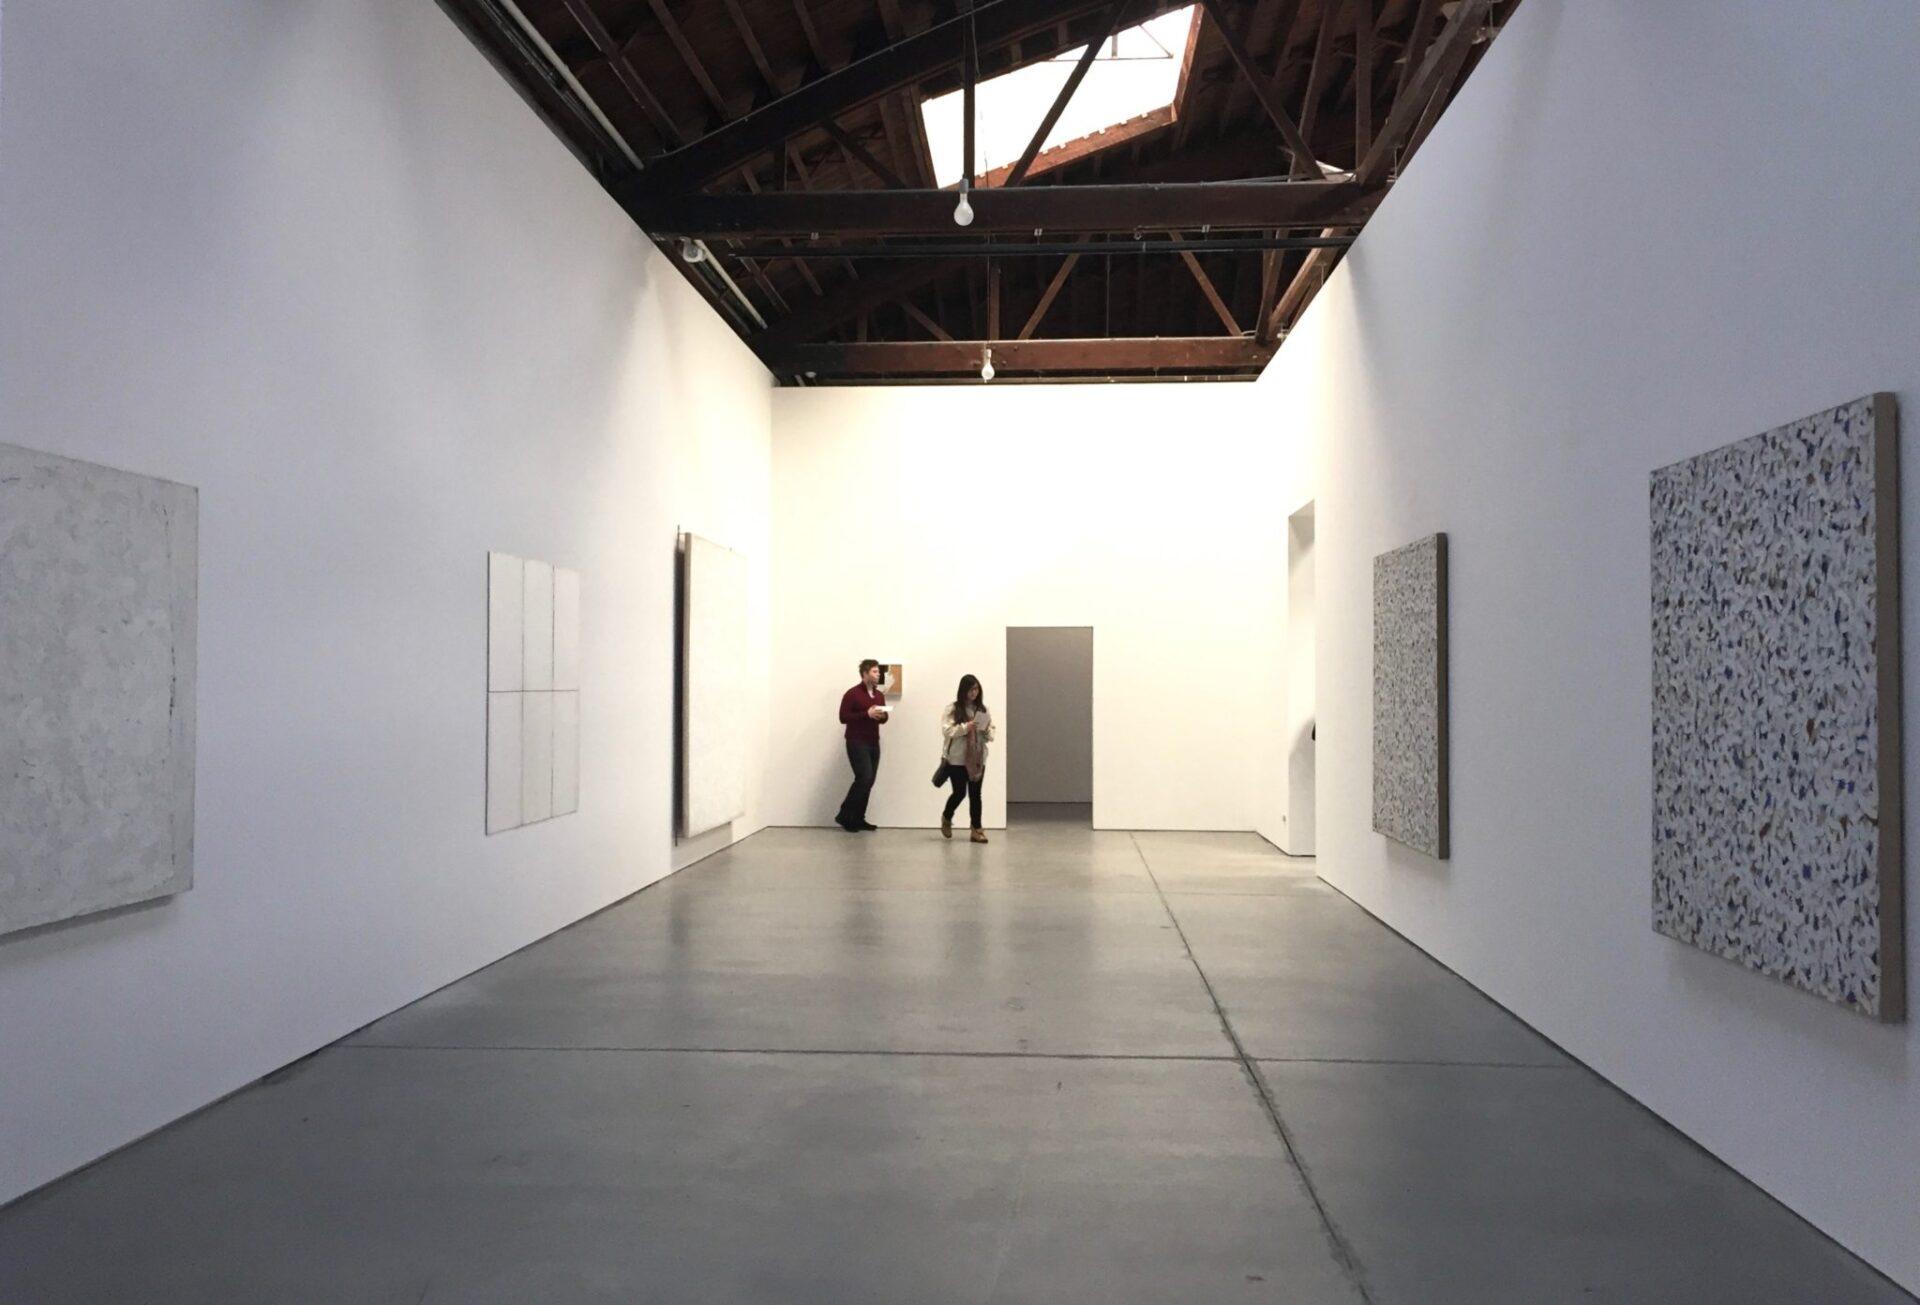 Robert Ryman. Gallery 1, installation view. Dia:Chelsea